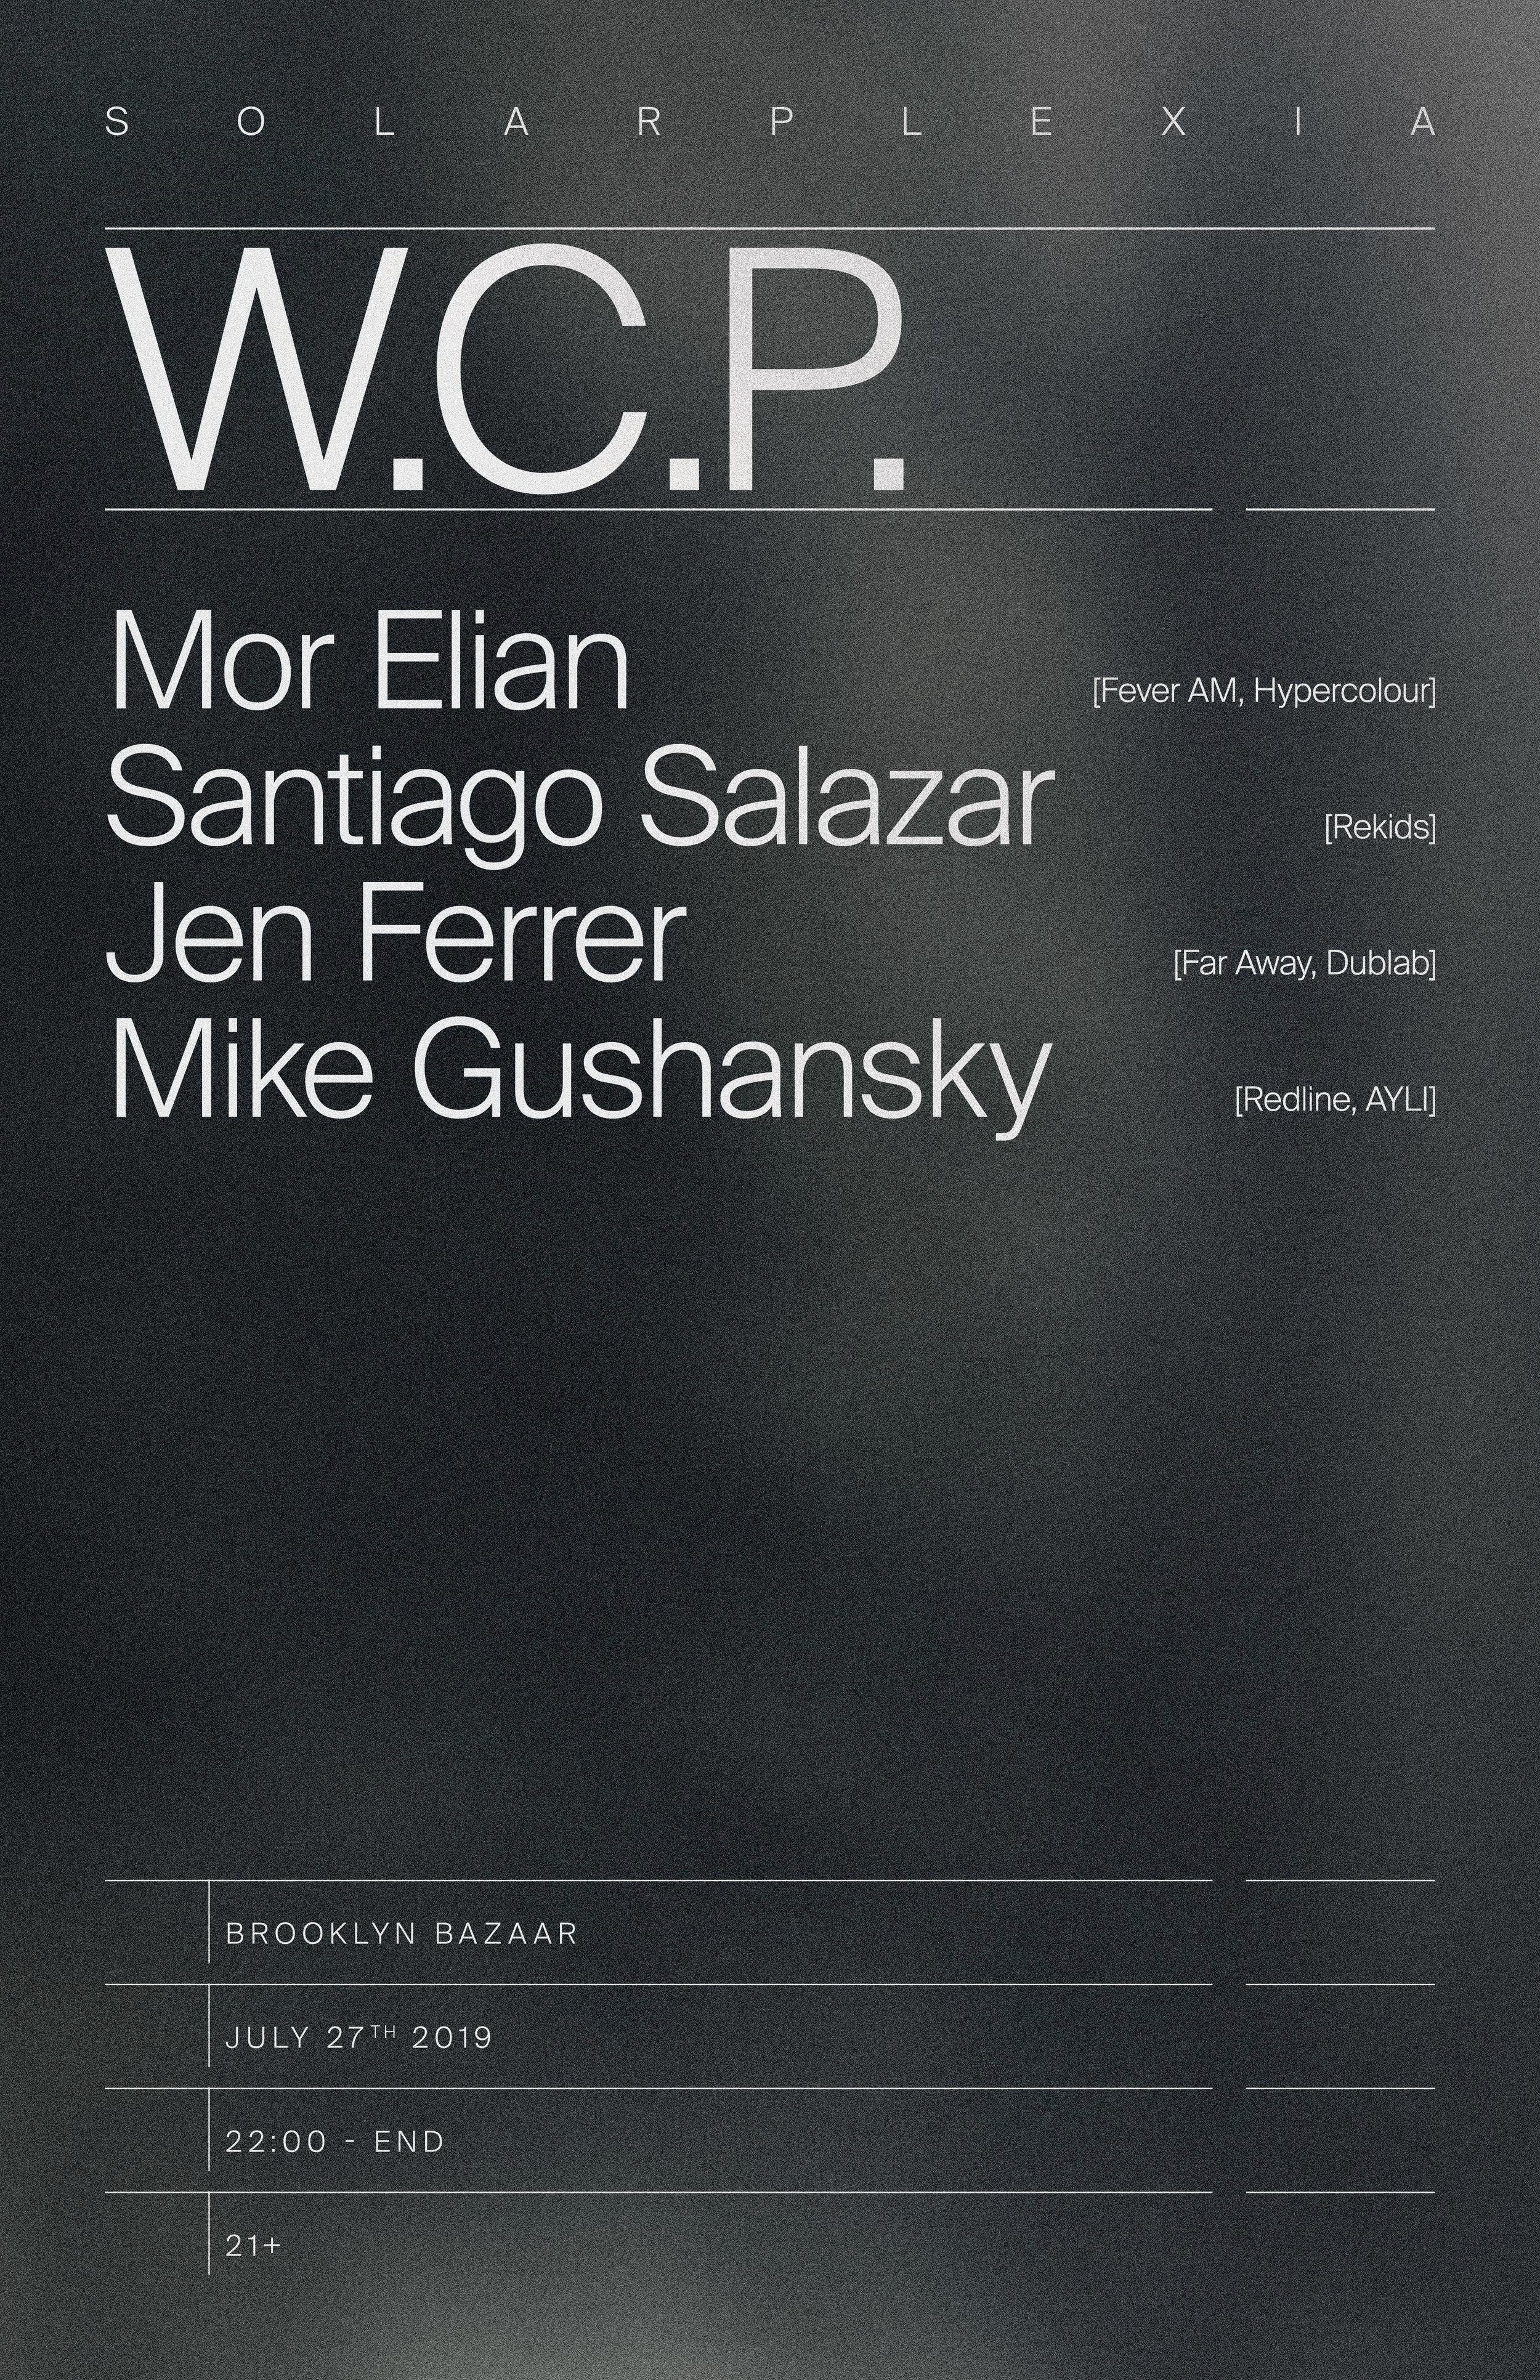 Solarplexia-WCP-Final.jpeg